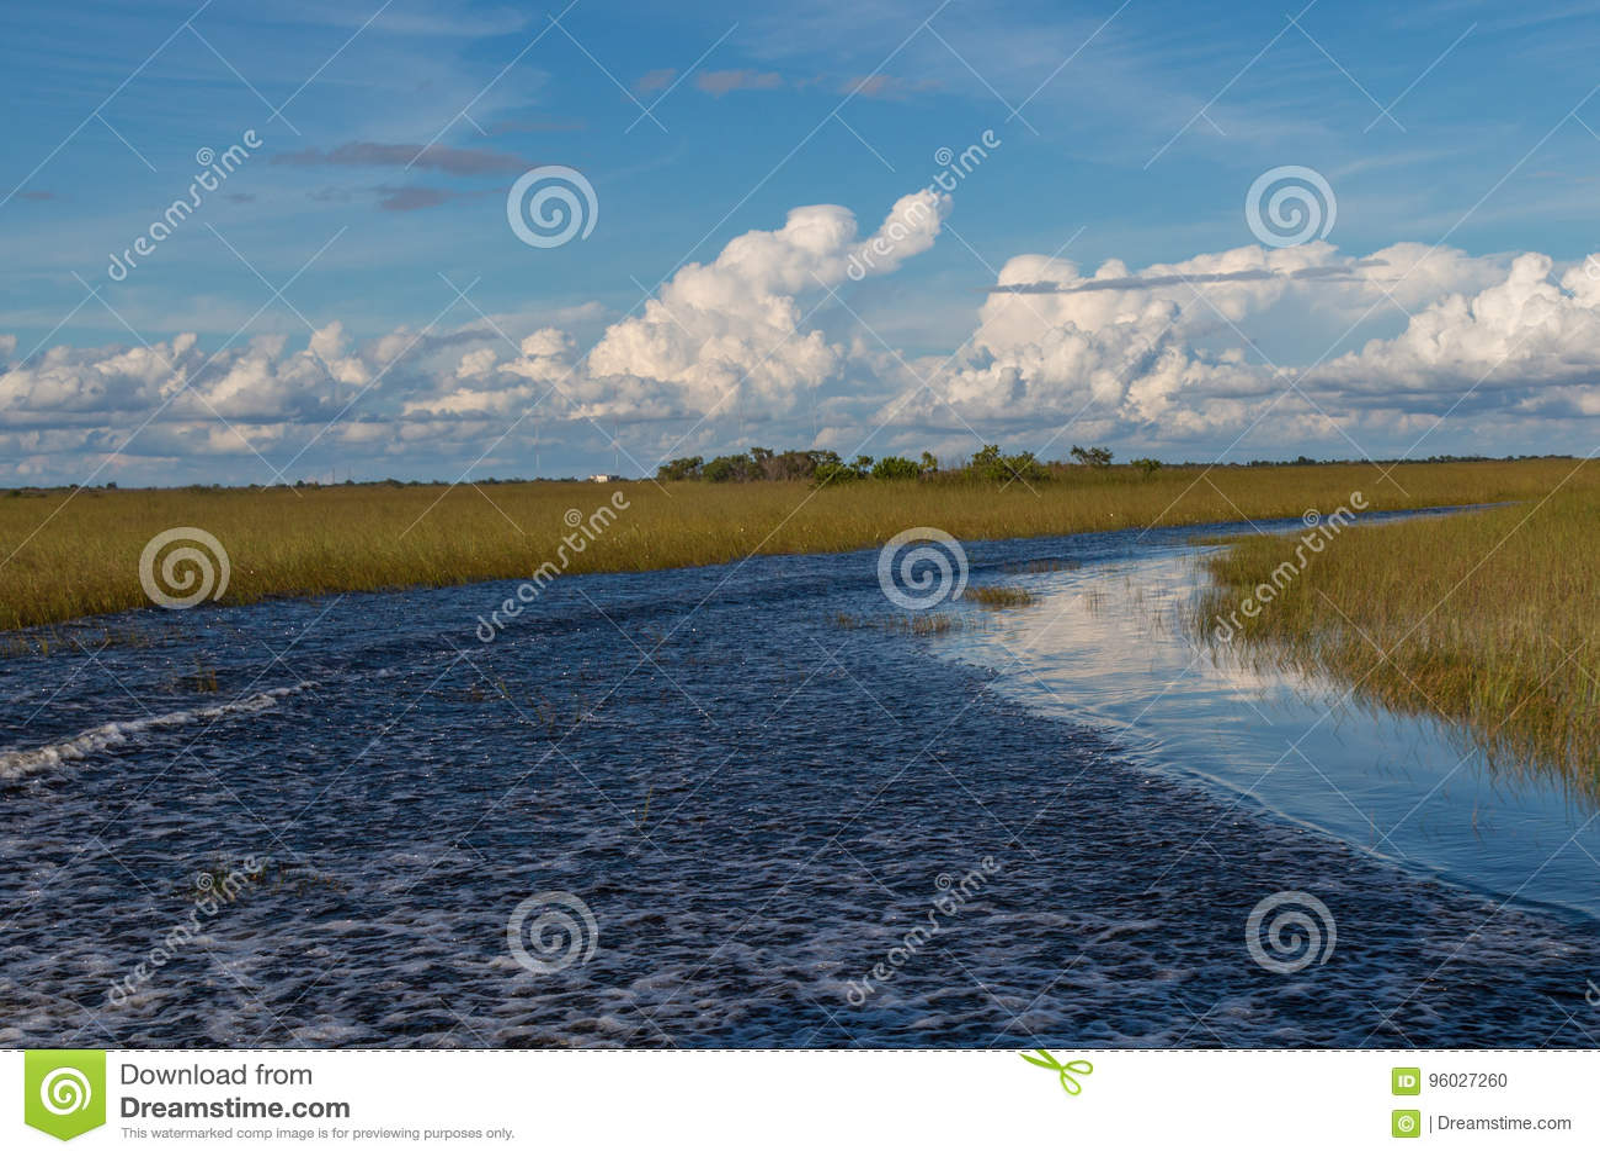 Jezioro w błota safari parku